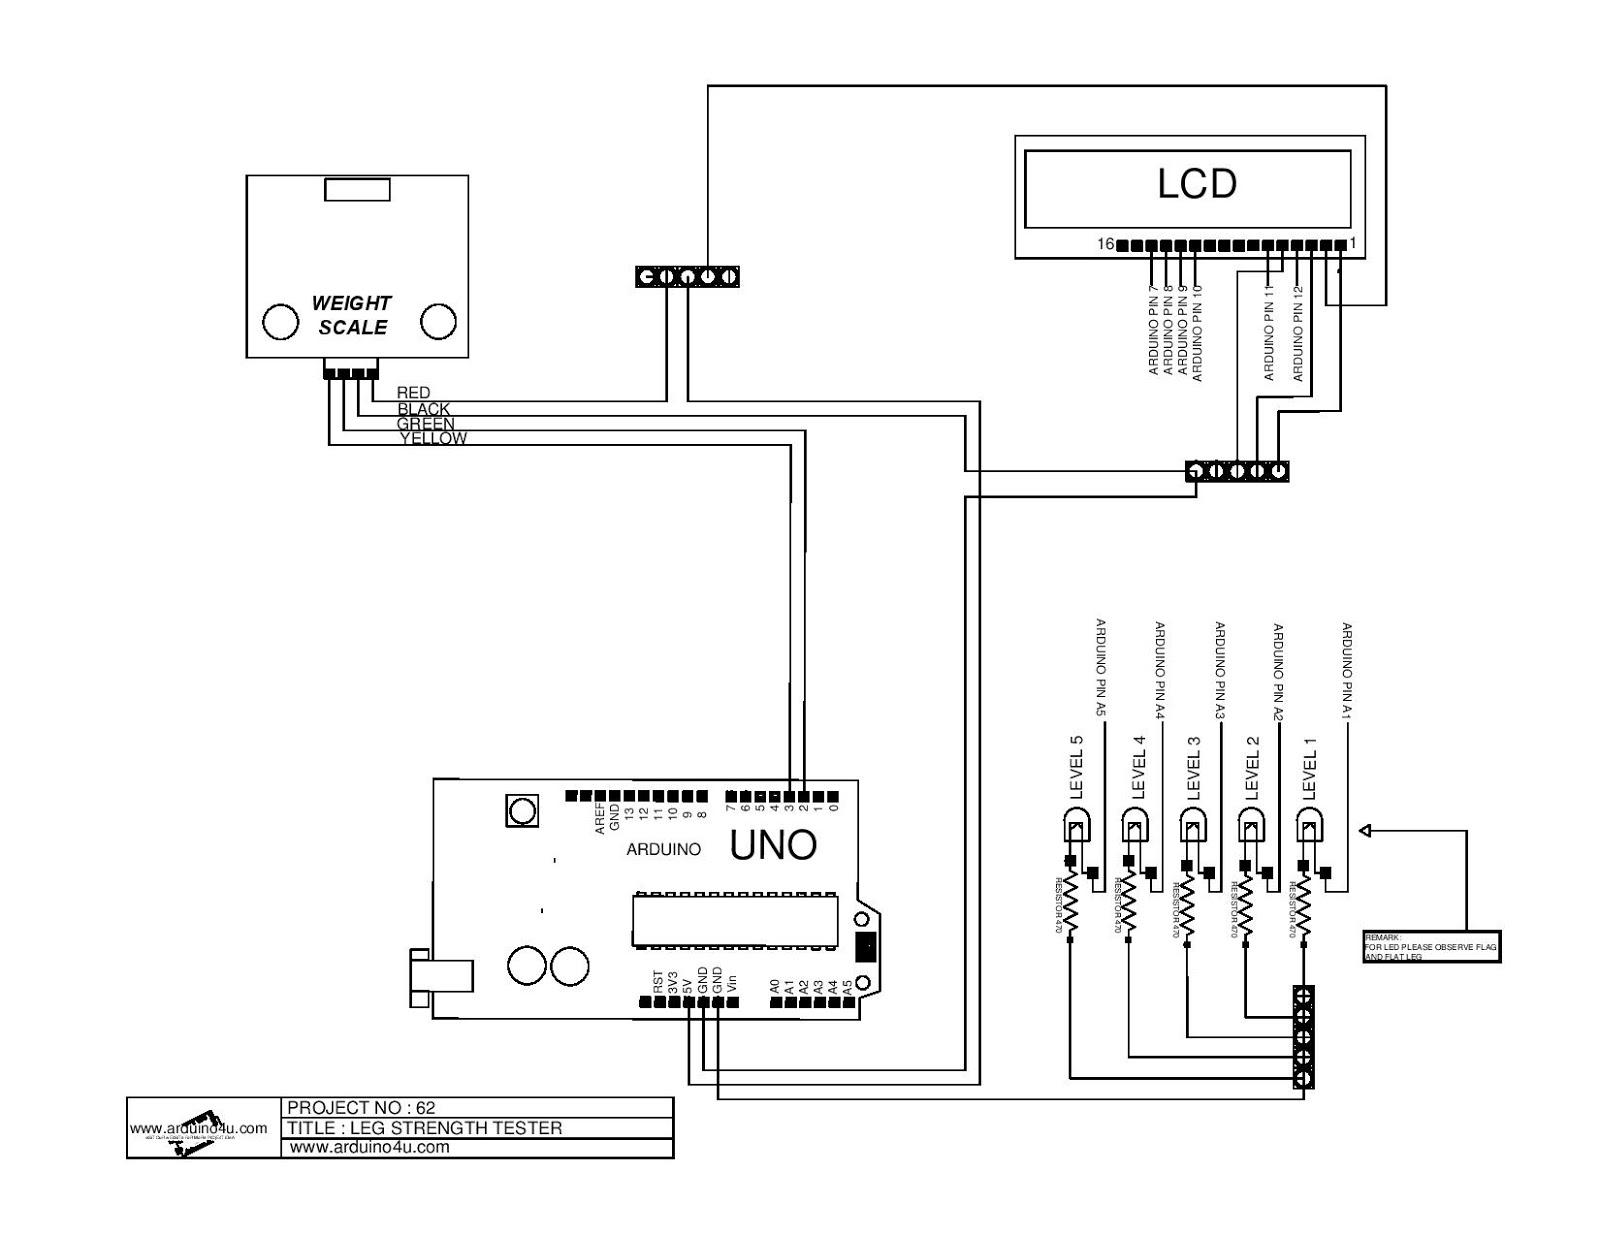 Projek Elektronik Arduino4u.com: 62.Leg Strength Tester